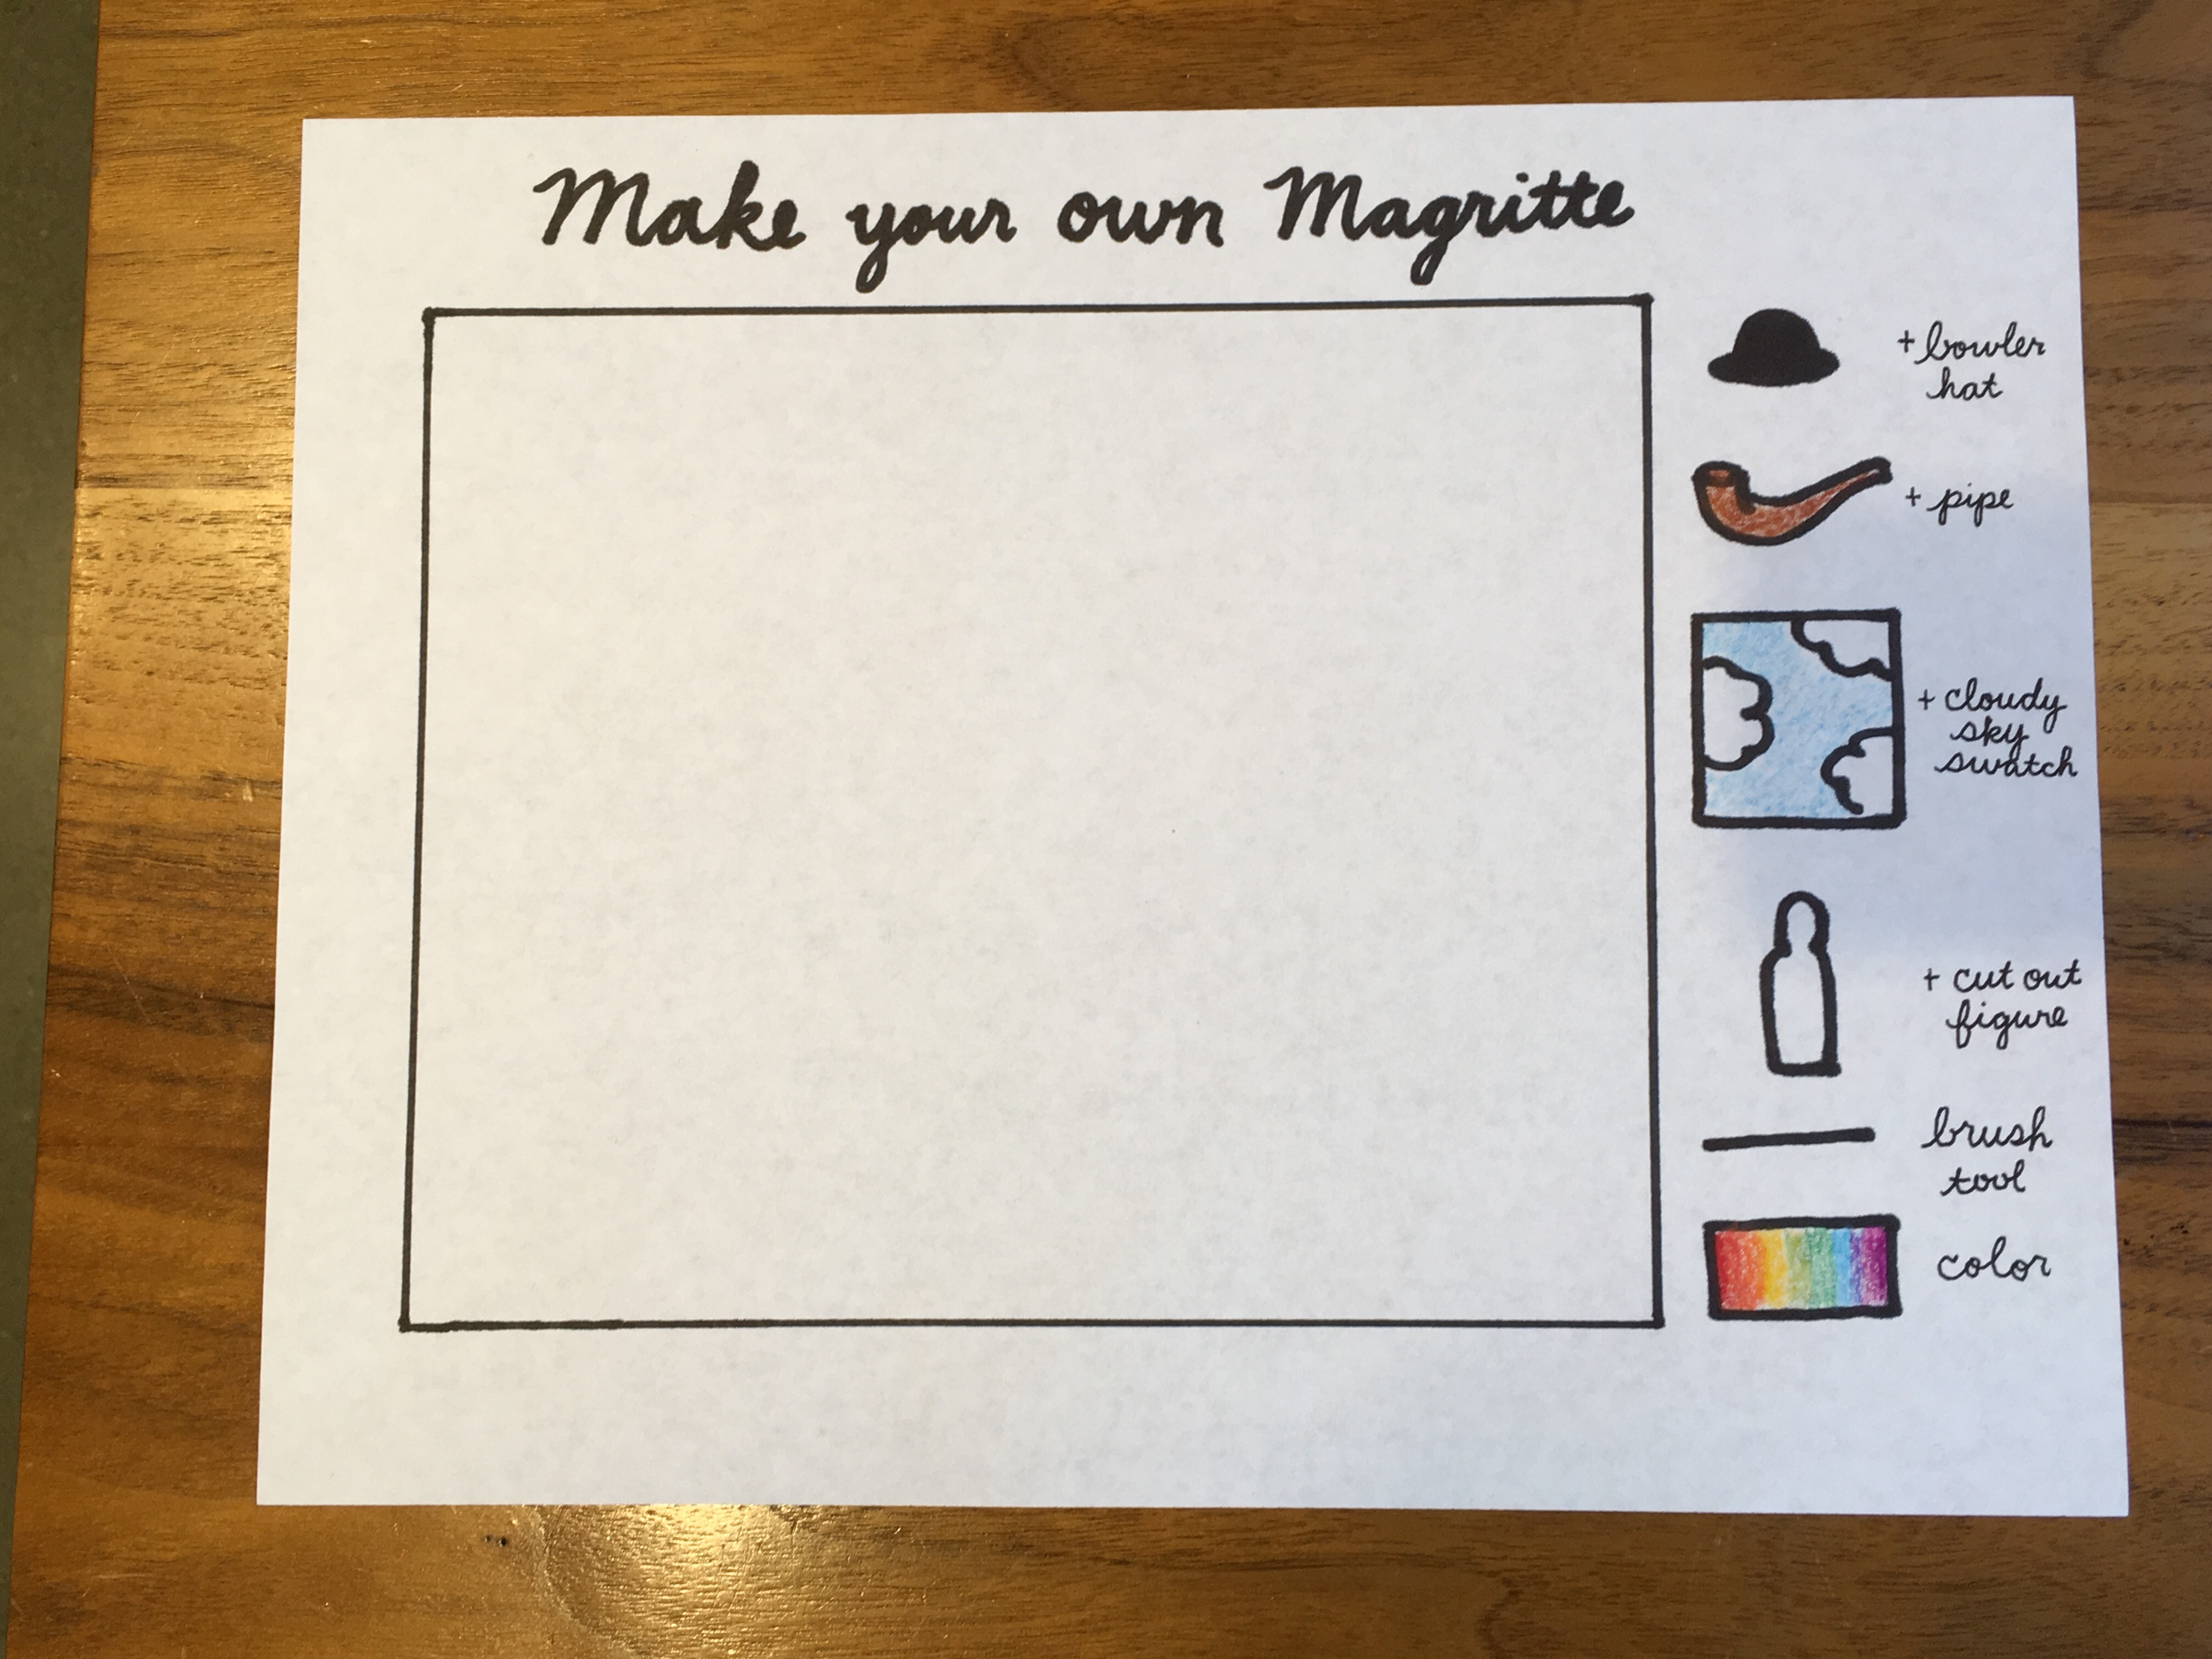 UI_Magritte